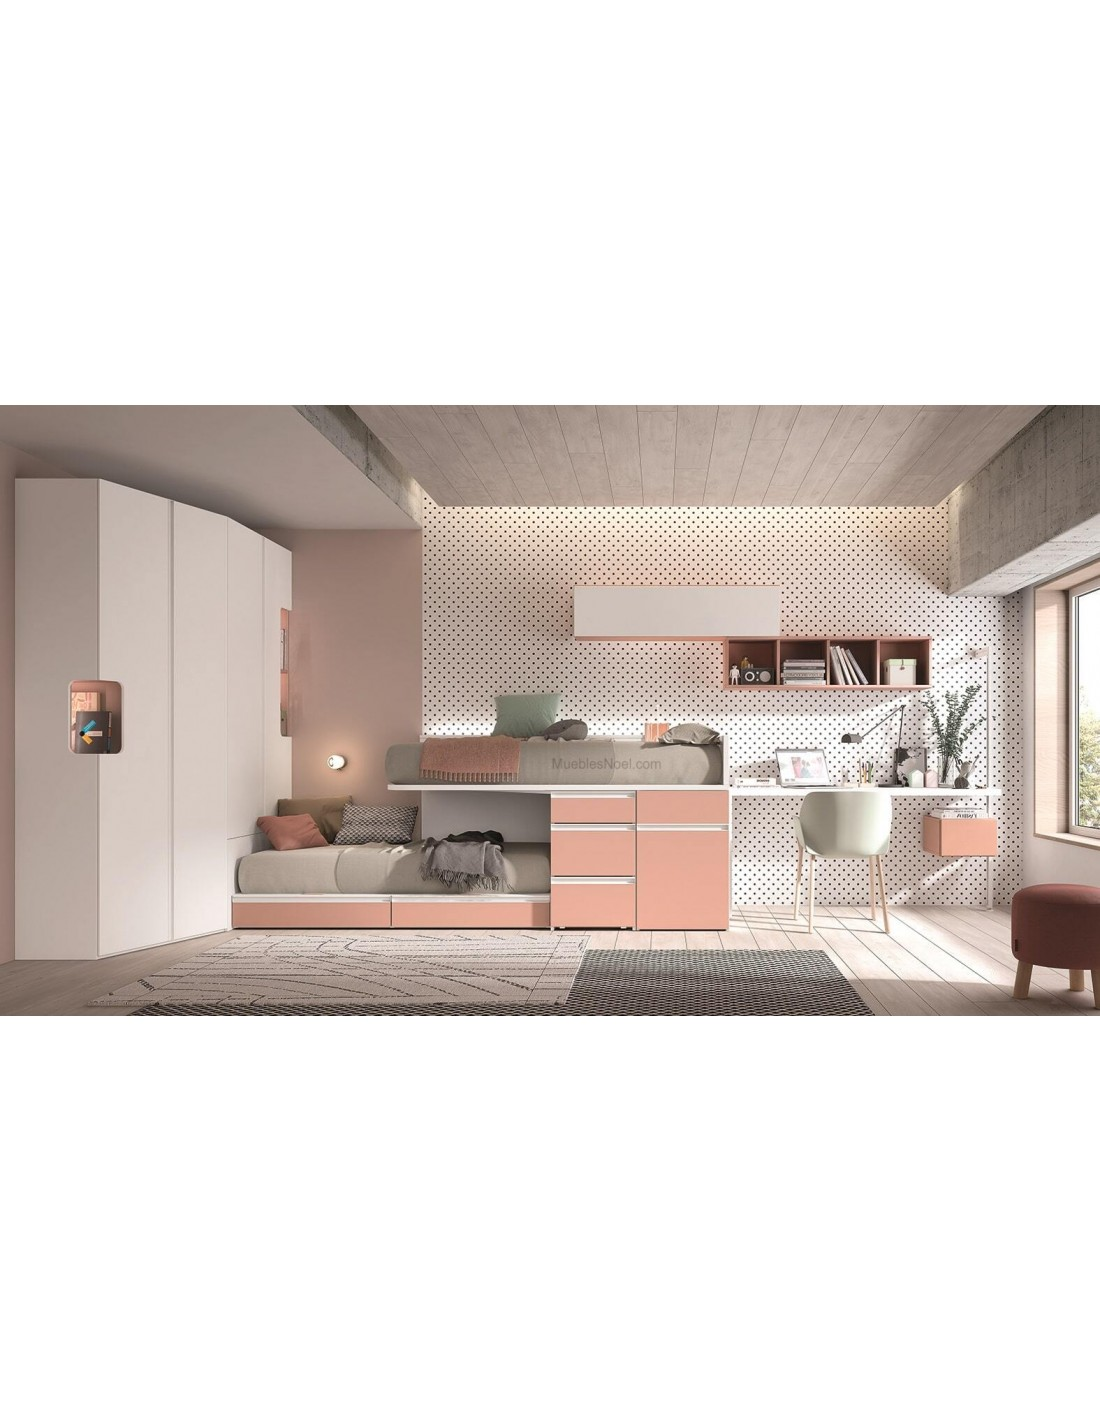 Dormitorio Juvenil Rosa 28014 Madrid